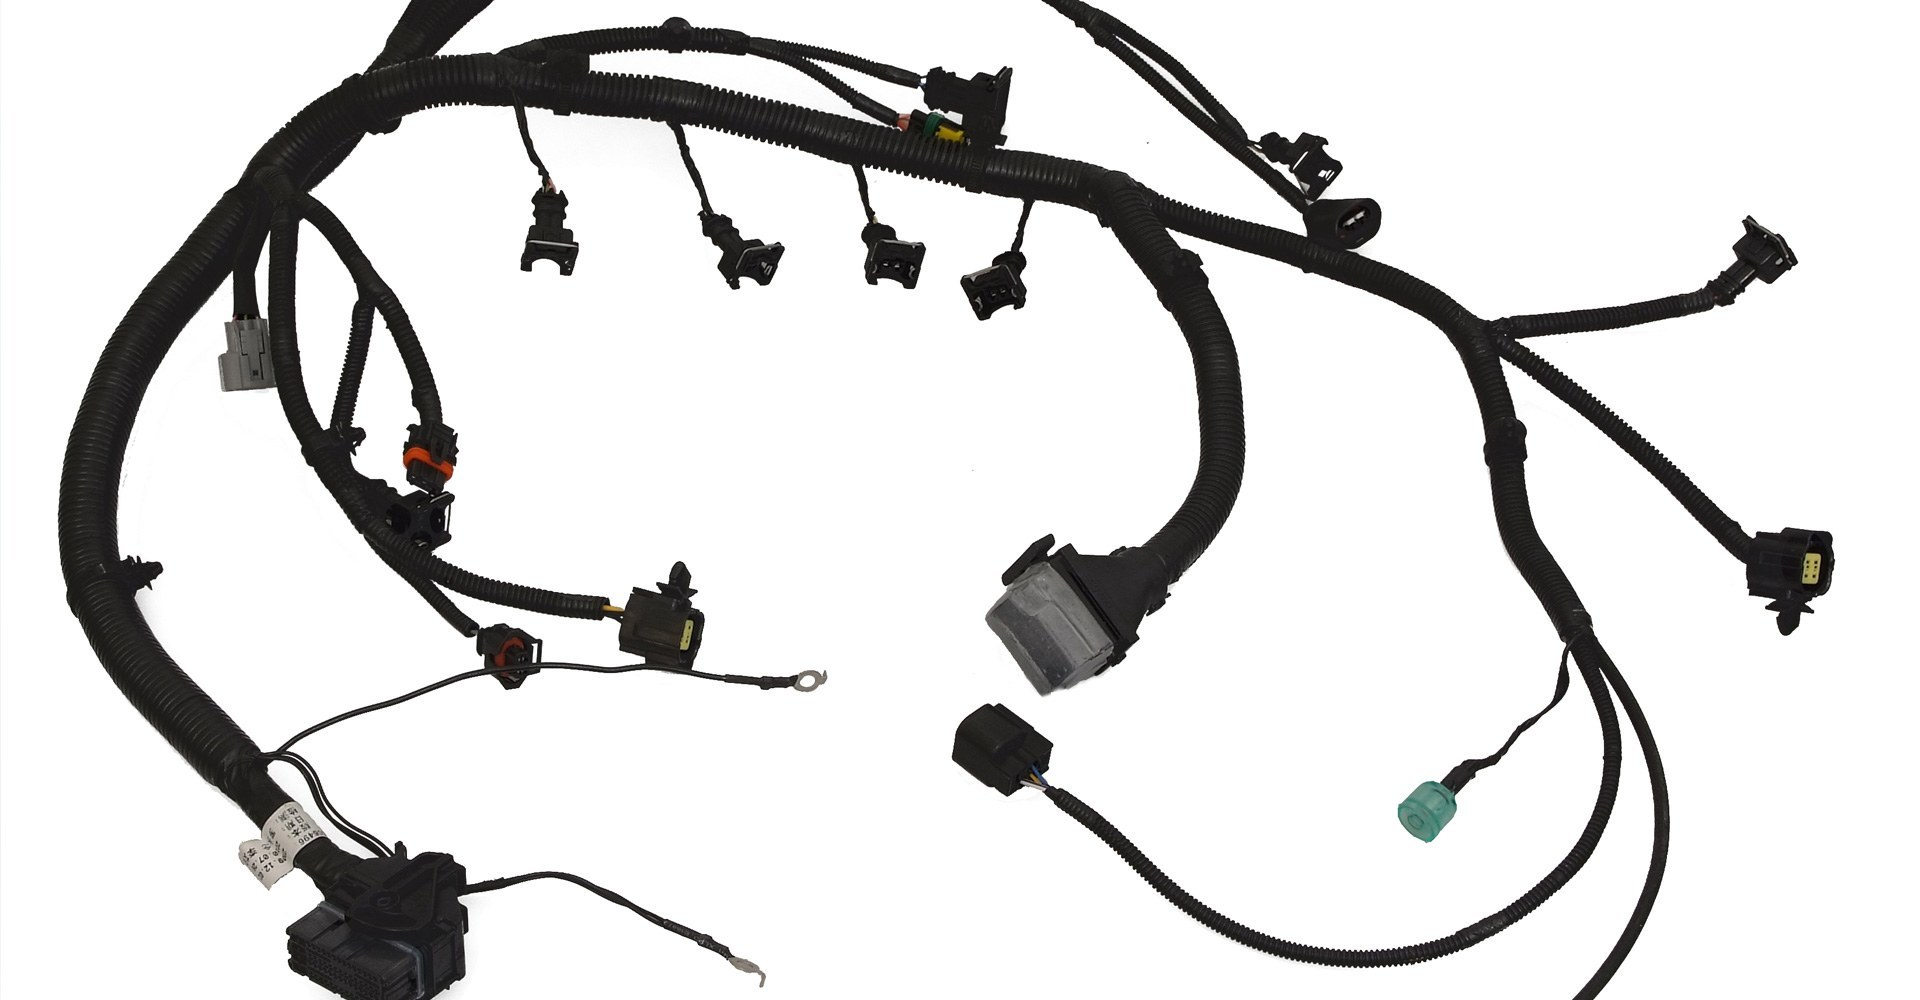 Wireharness tape